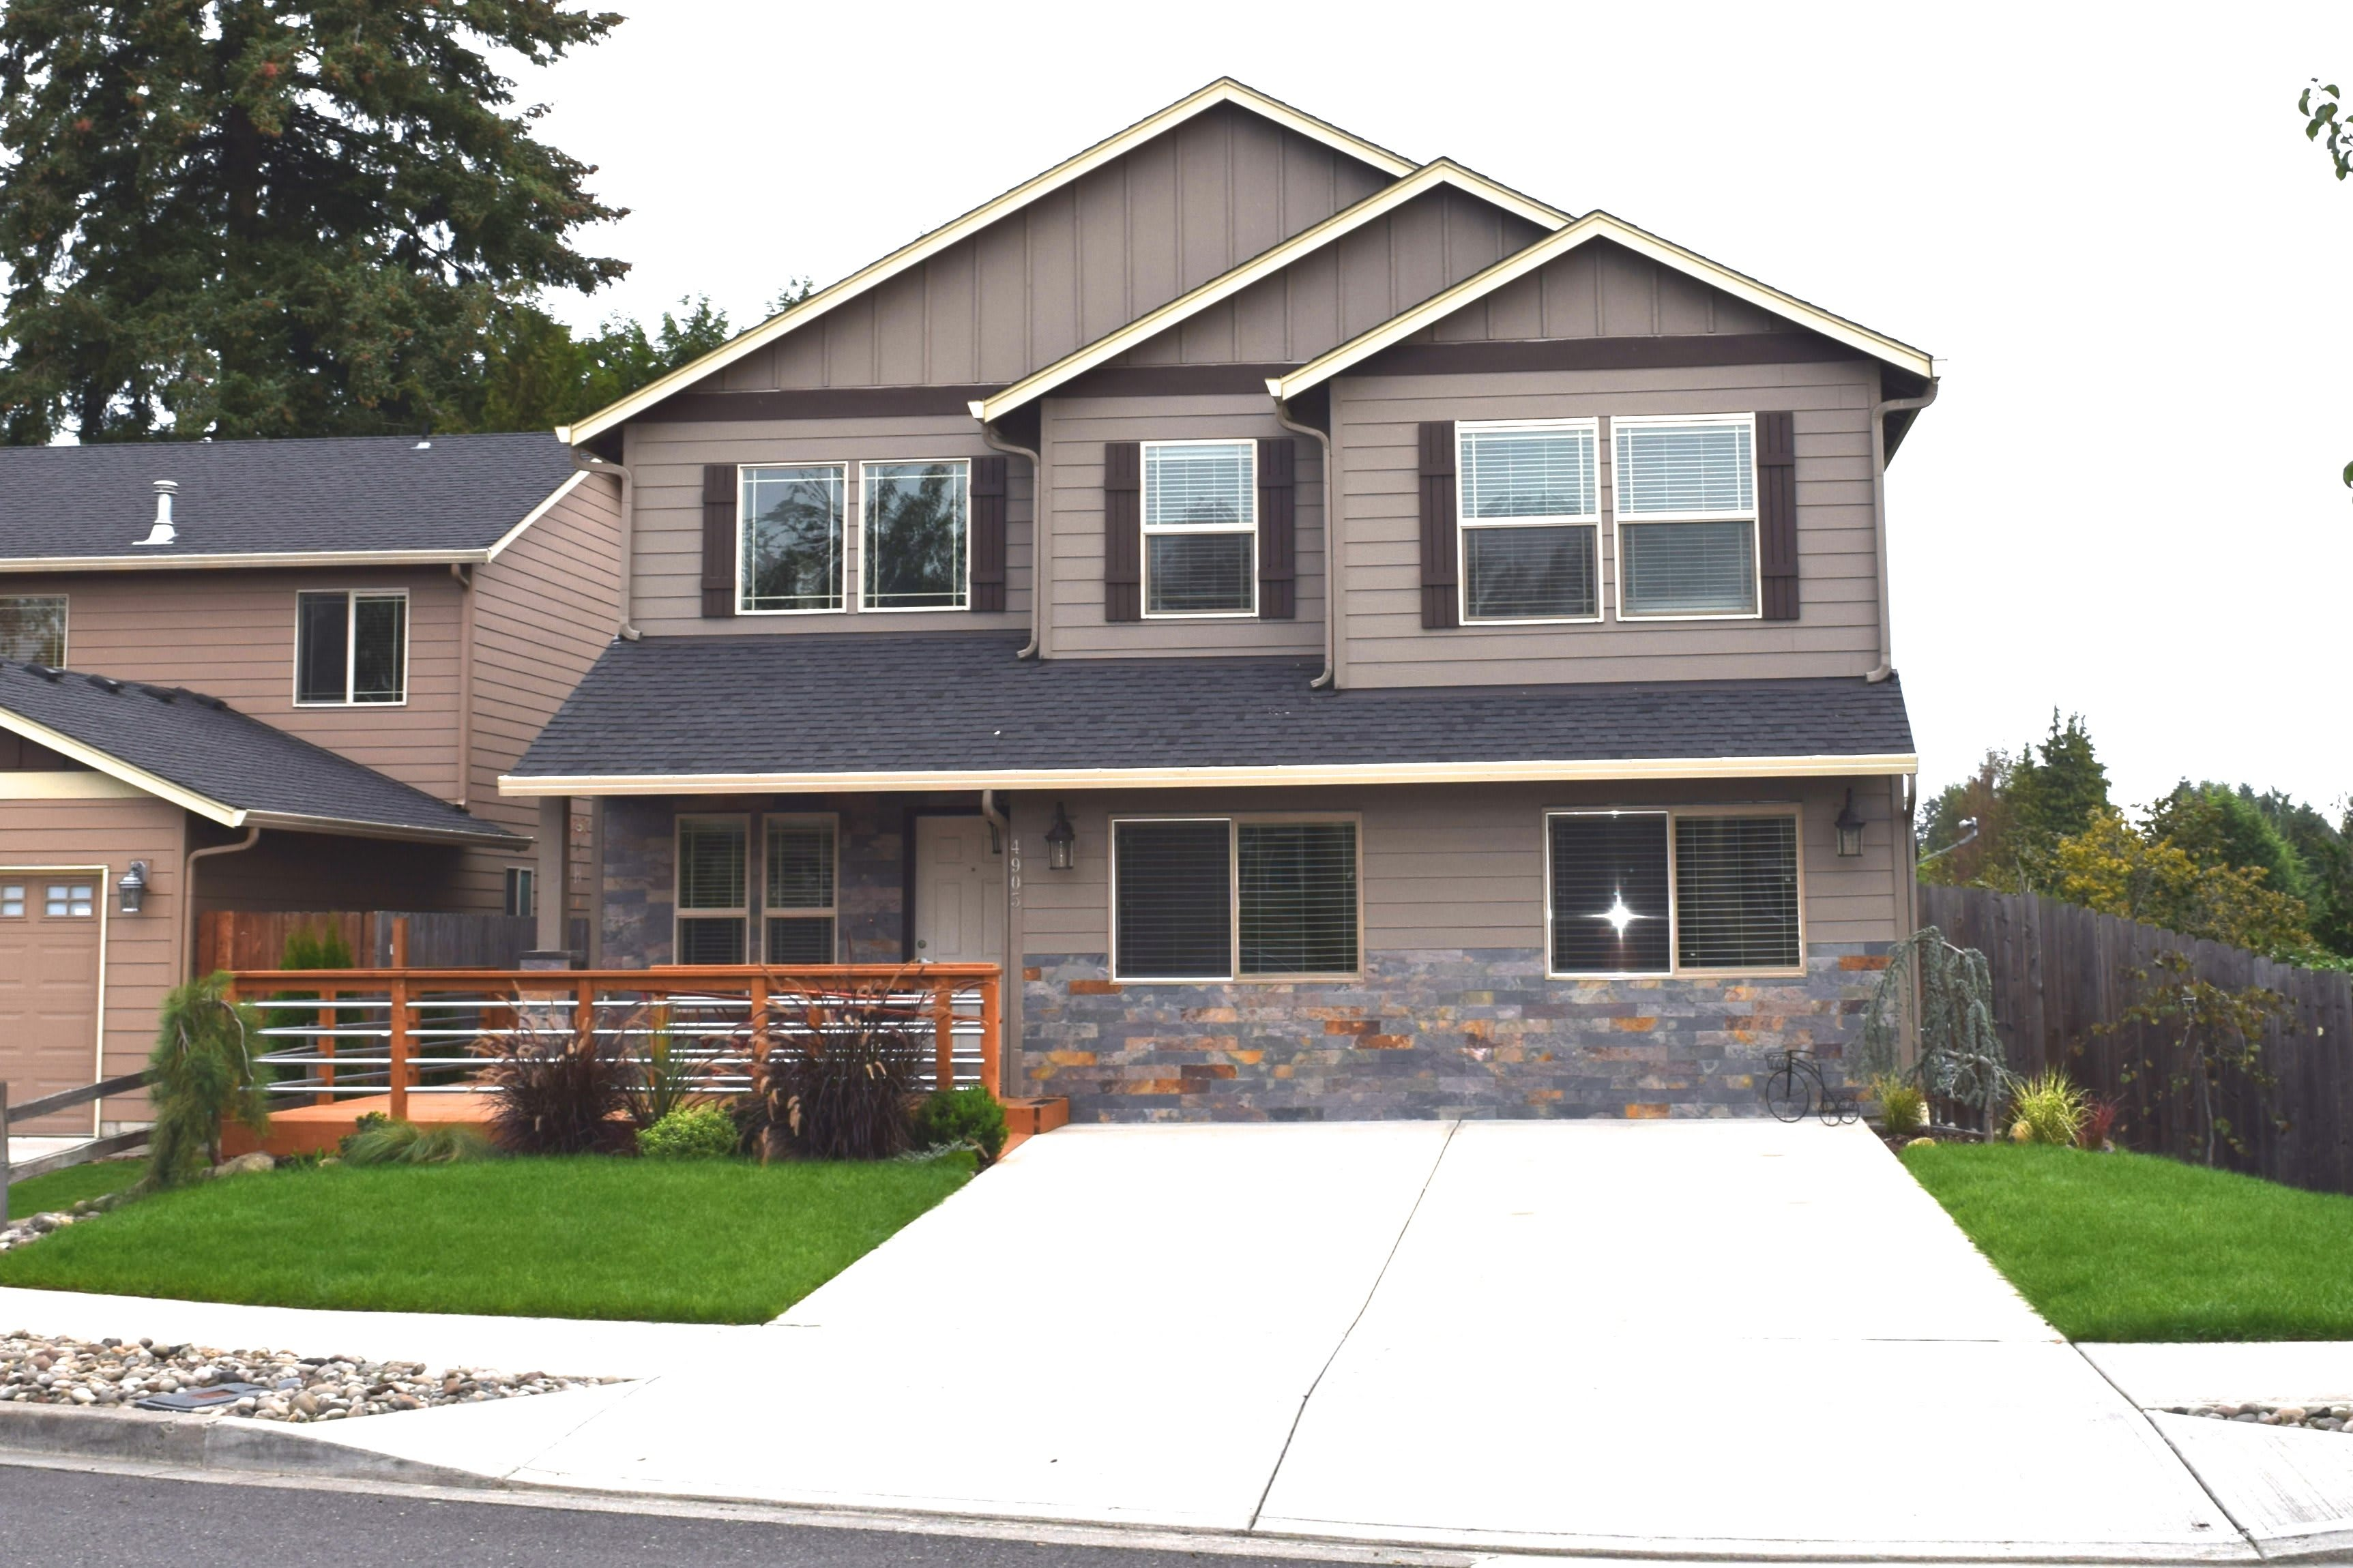 Photo 1 of Summer Breeze Home Care LLC